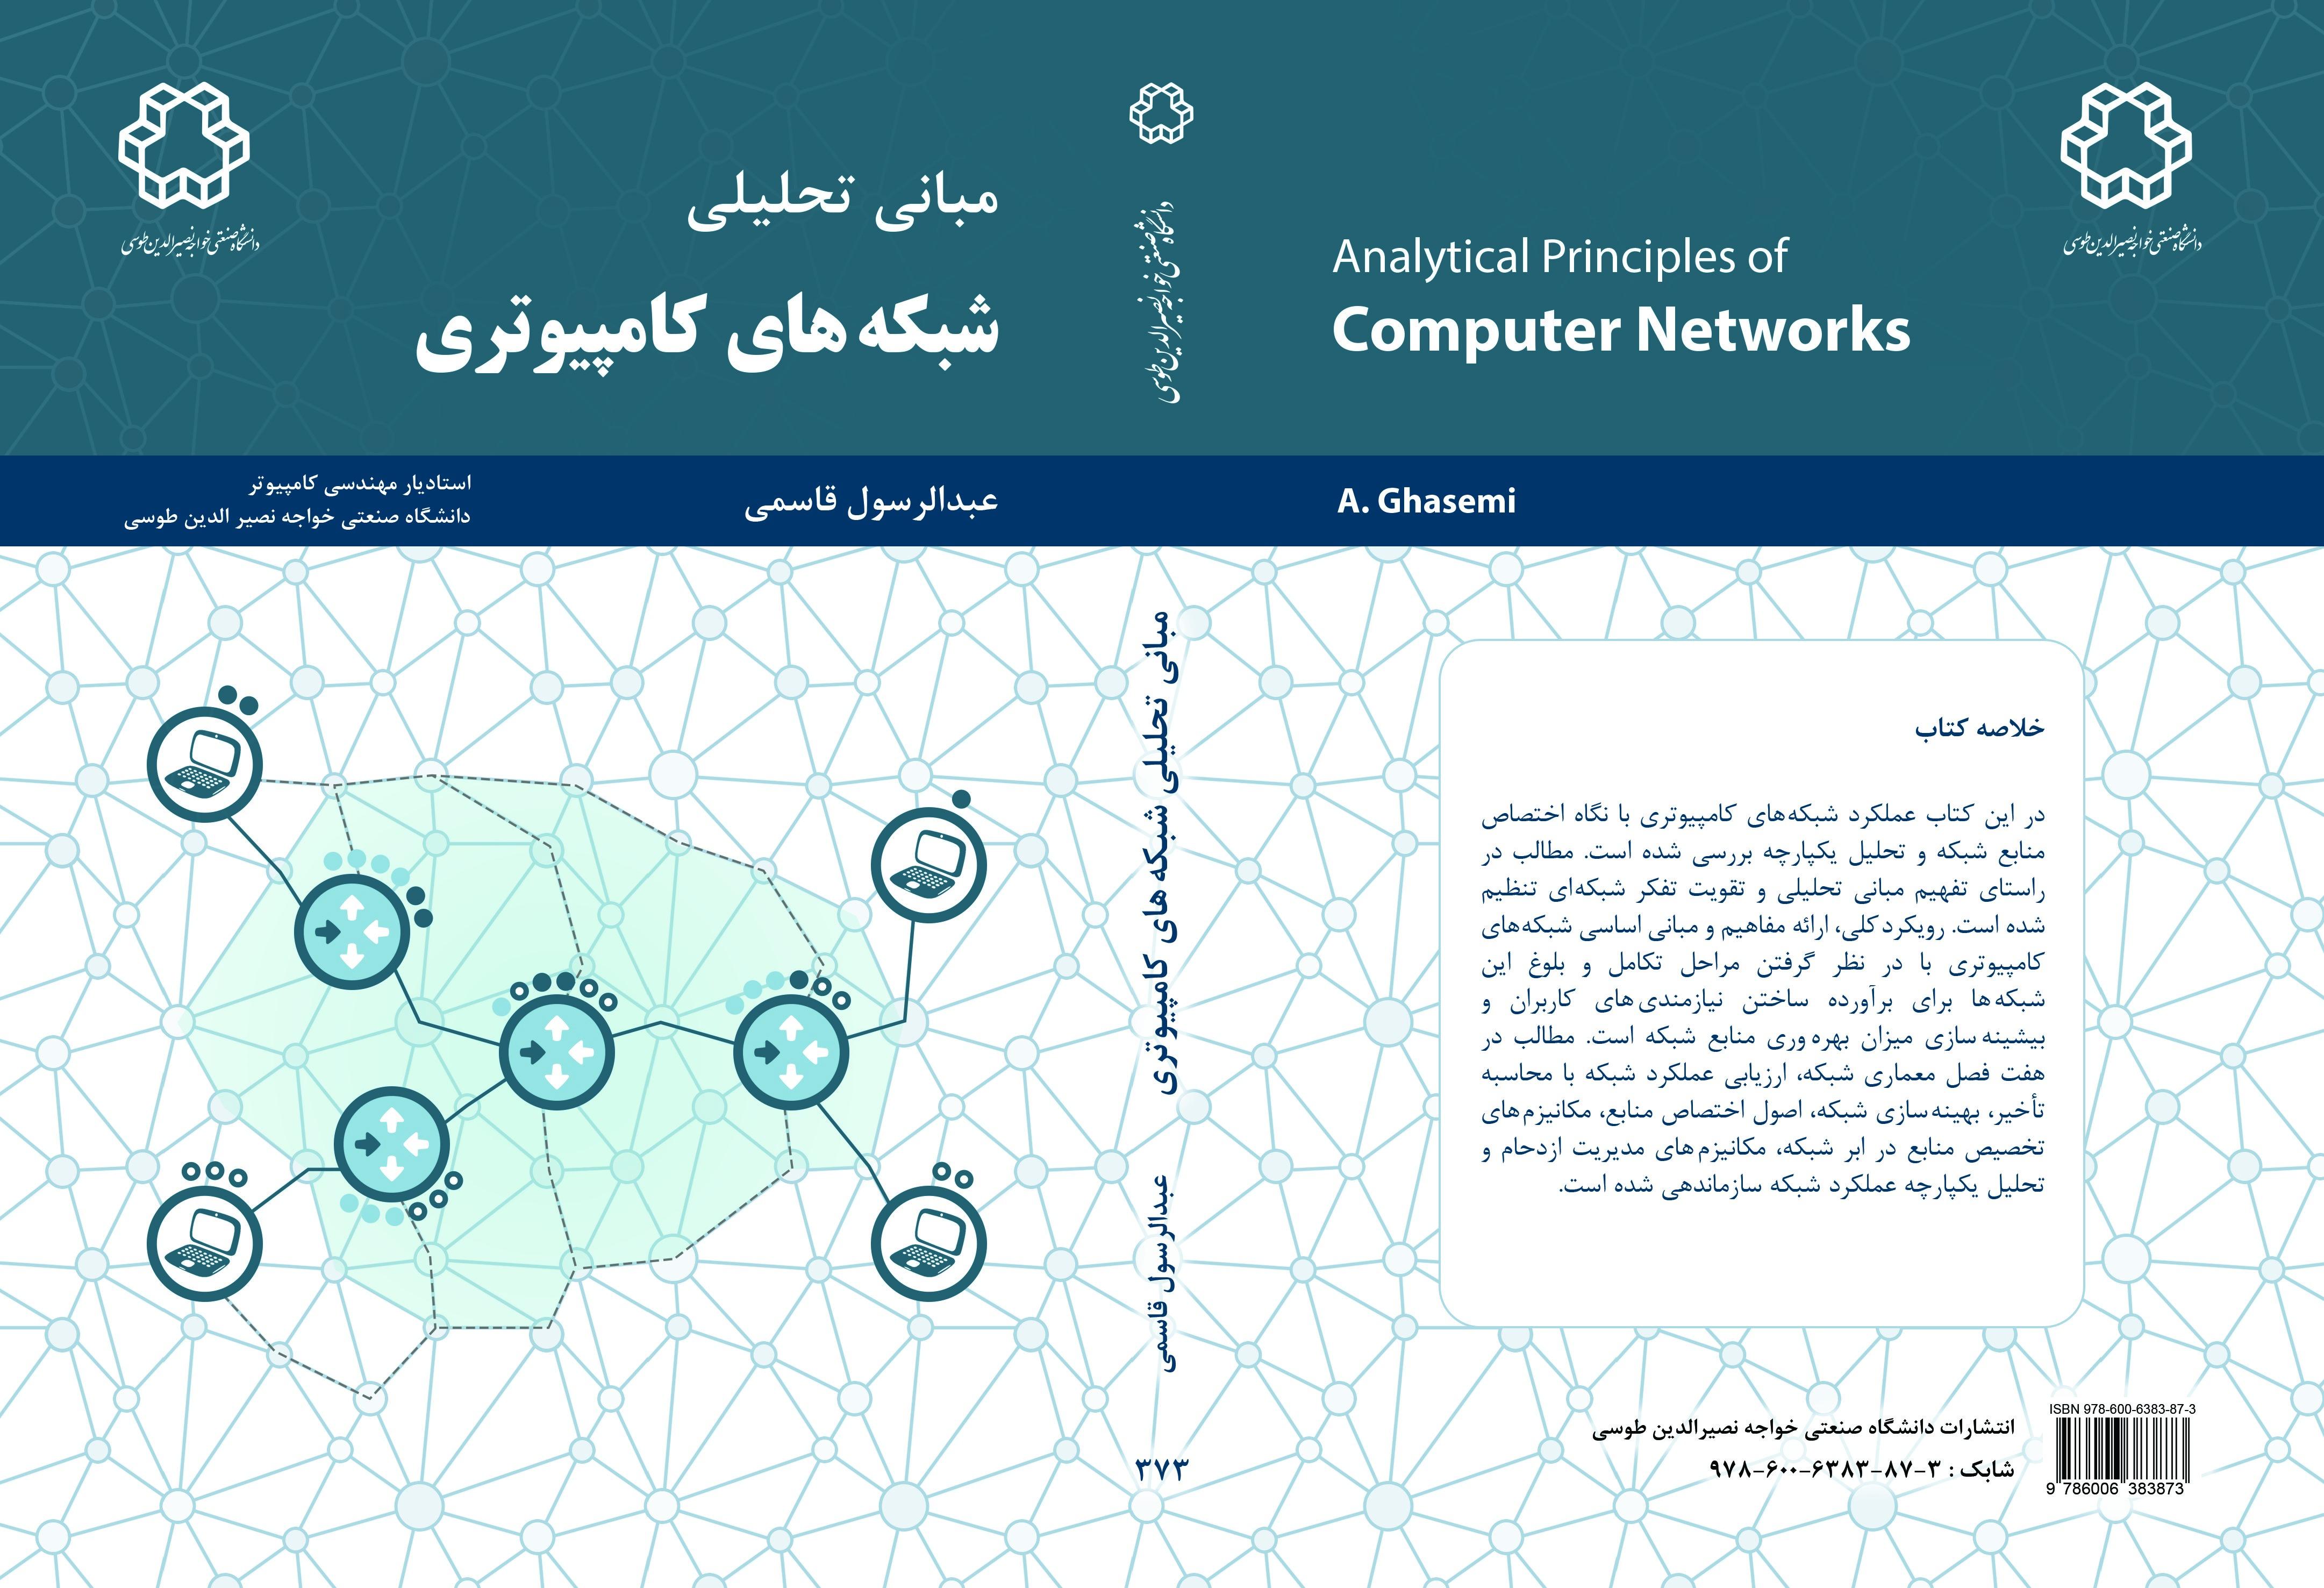 Abdorasoul Ghasemi Curriculum Vitae